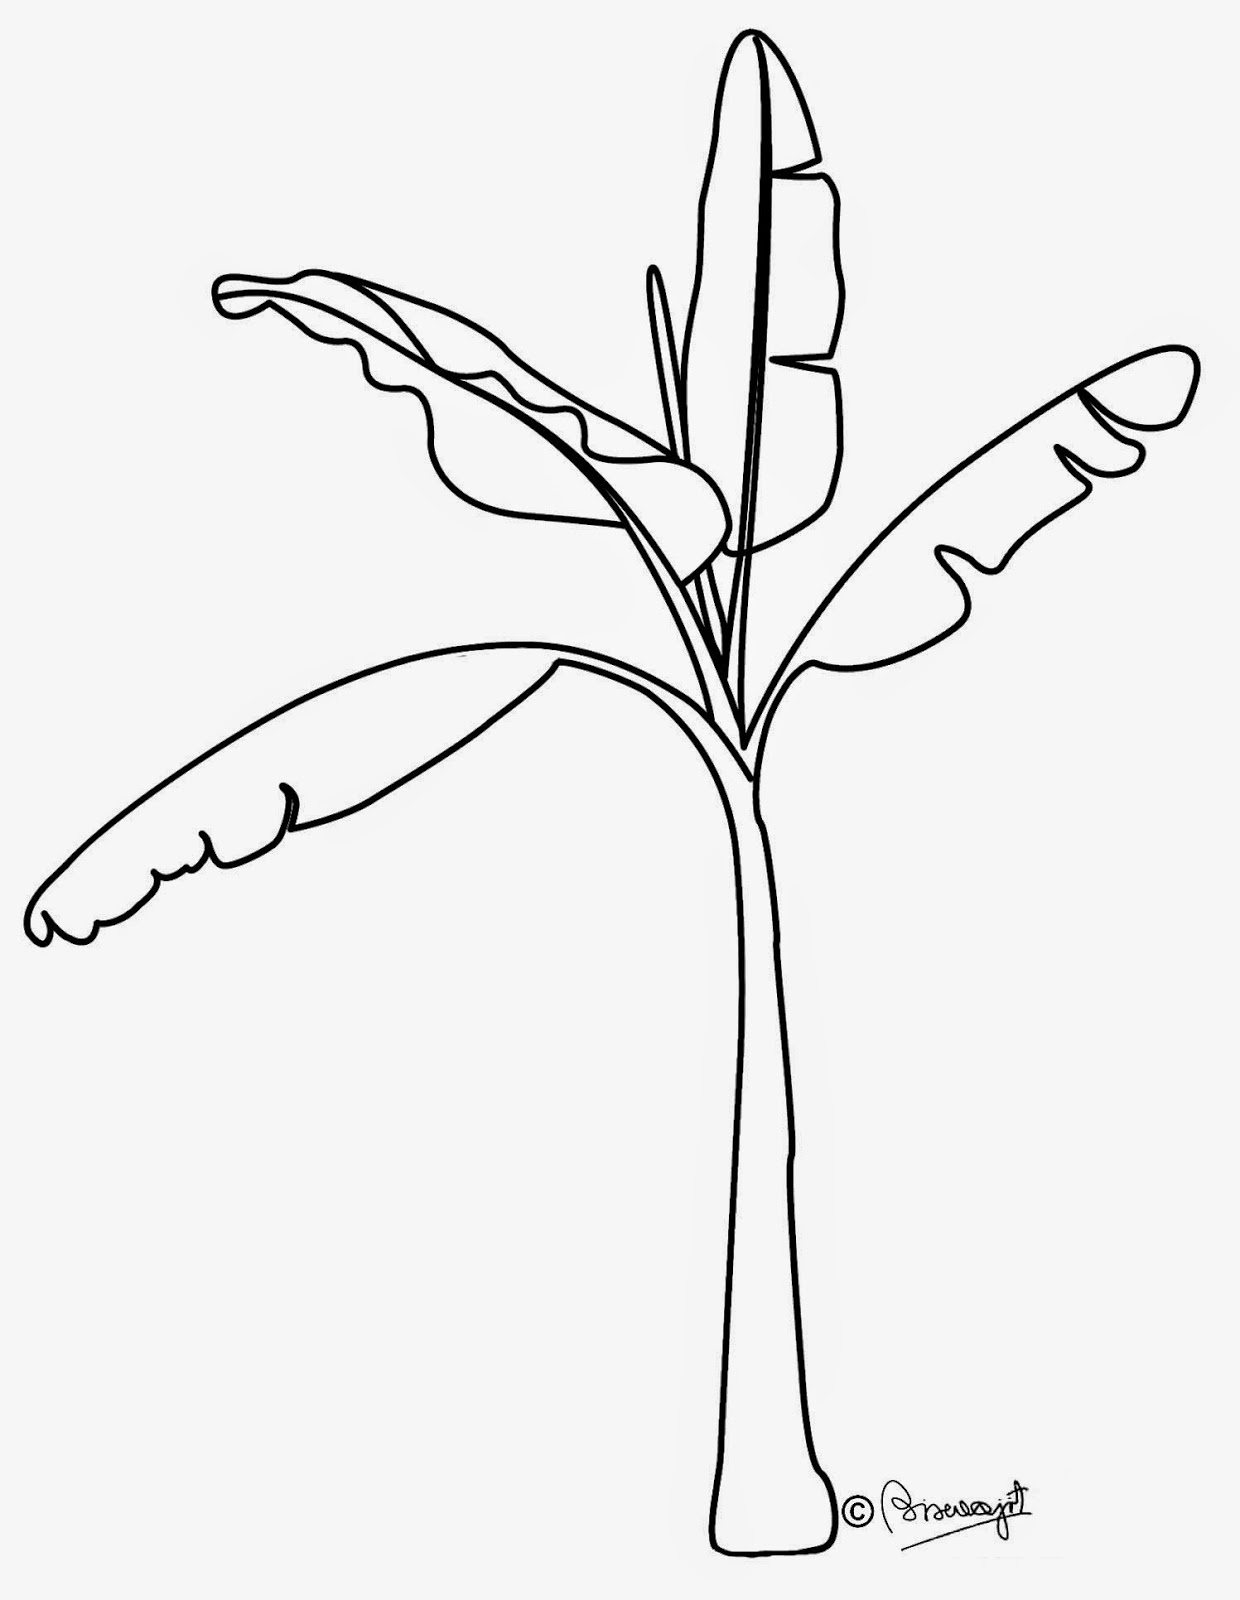 Banana tree clipart black and white 2 » Clipart Station.